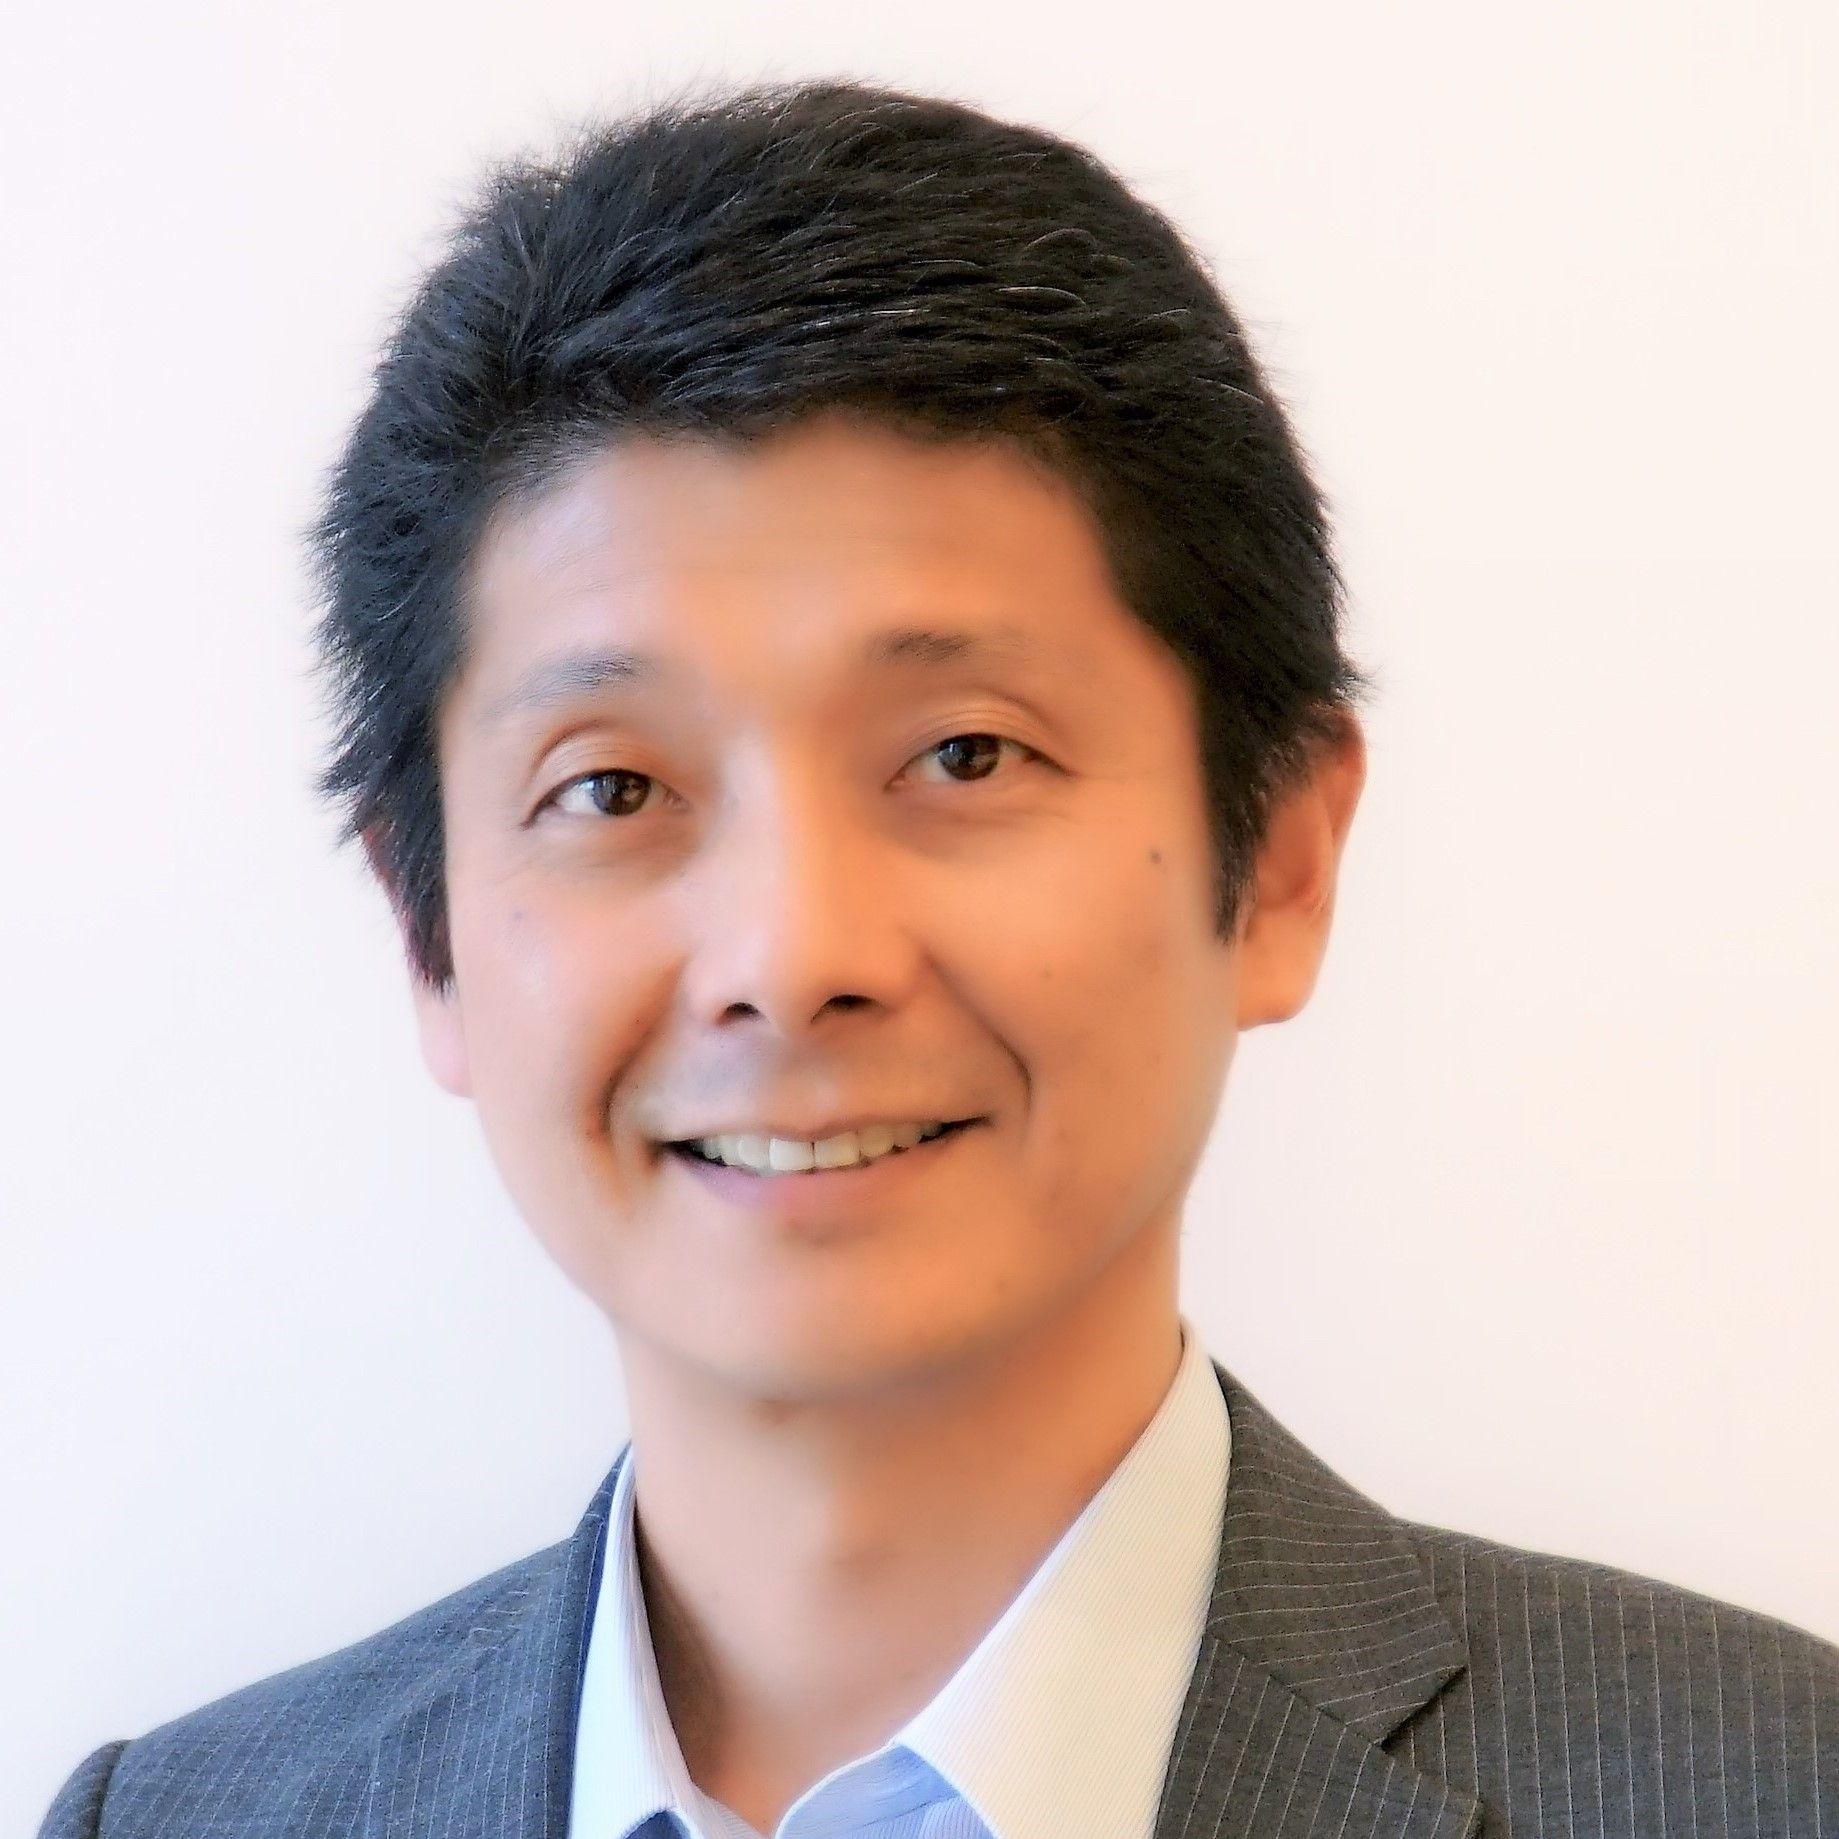 Nobuhiro Suga